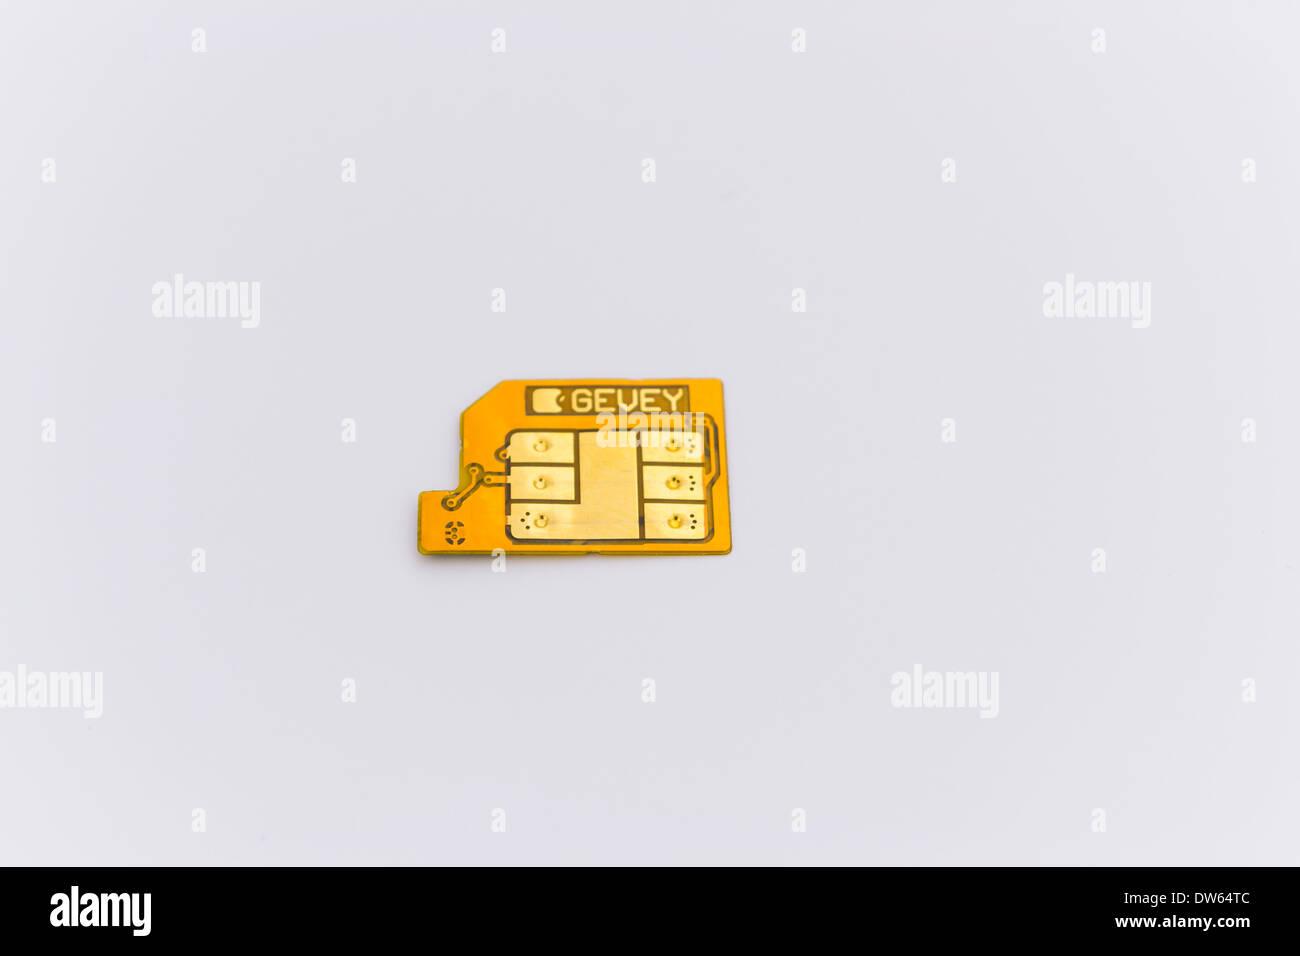 Gevey Ultra S unlock solution for iPhone smartphones - Stock Image